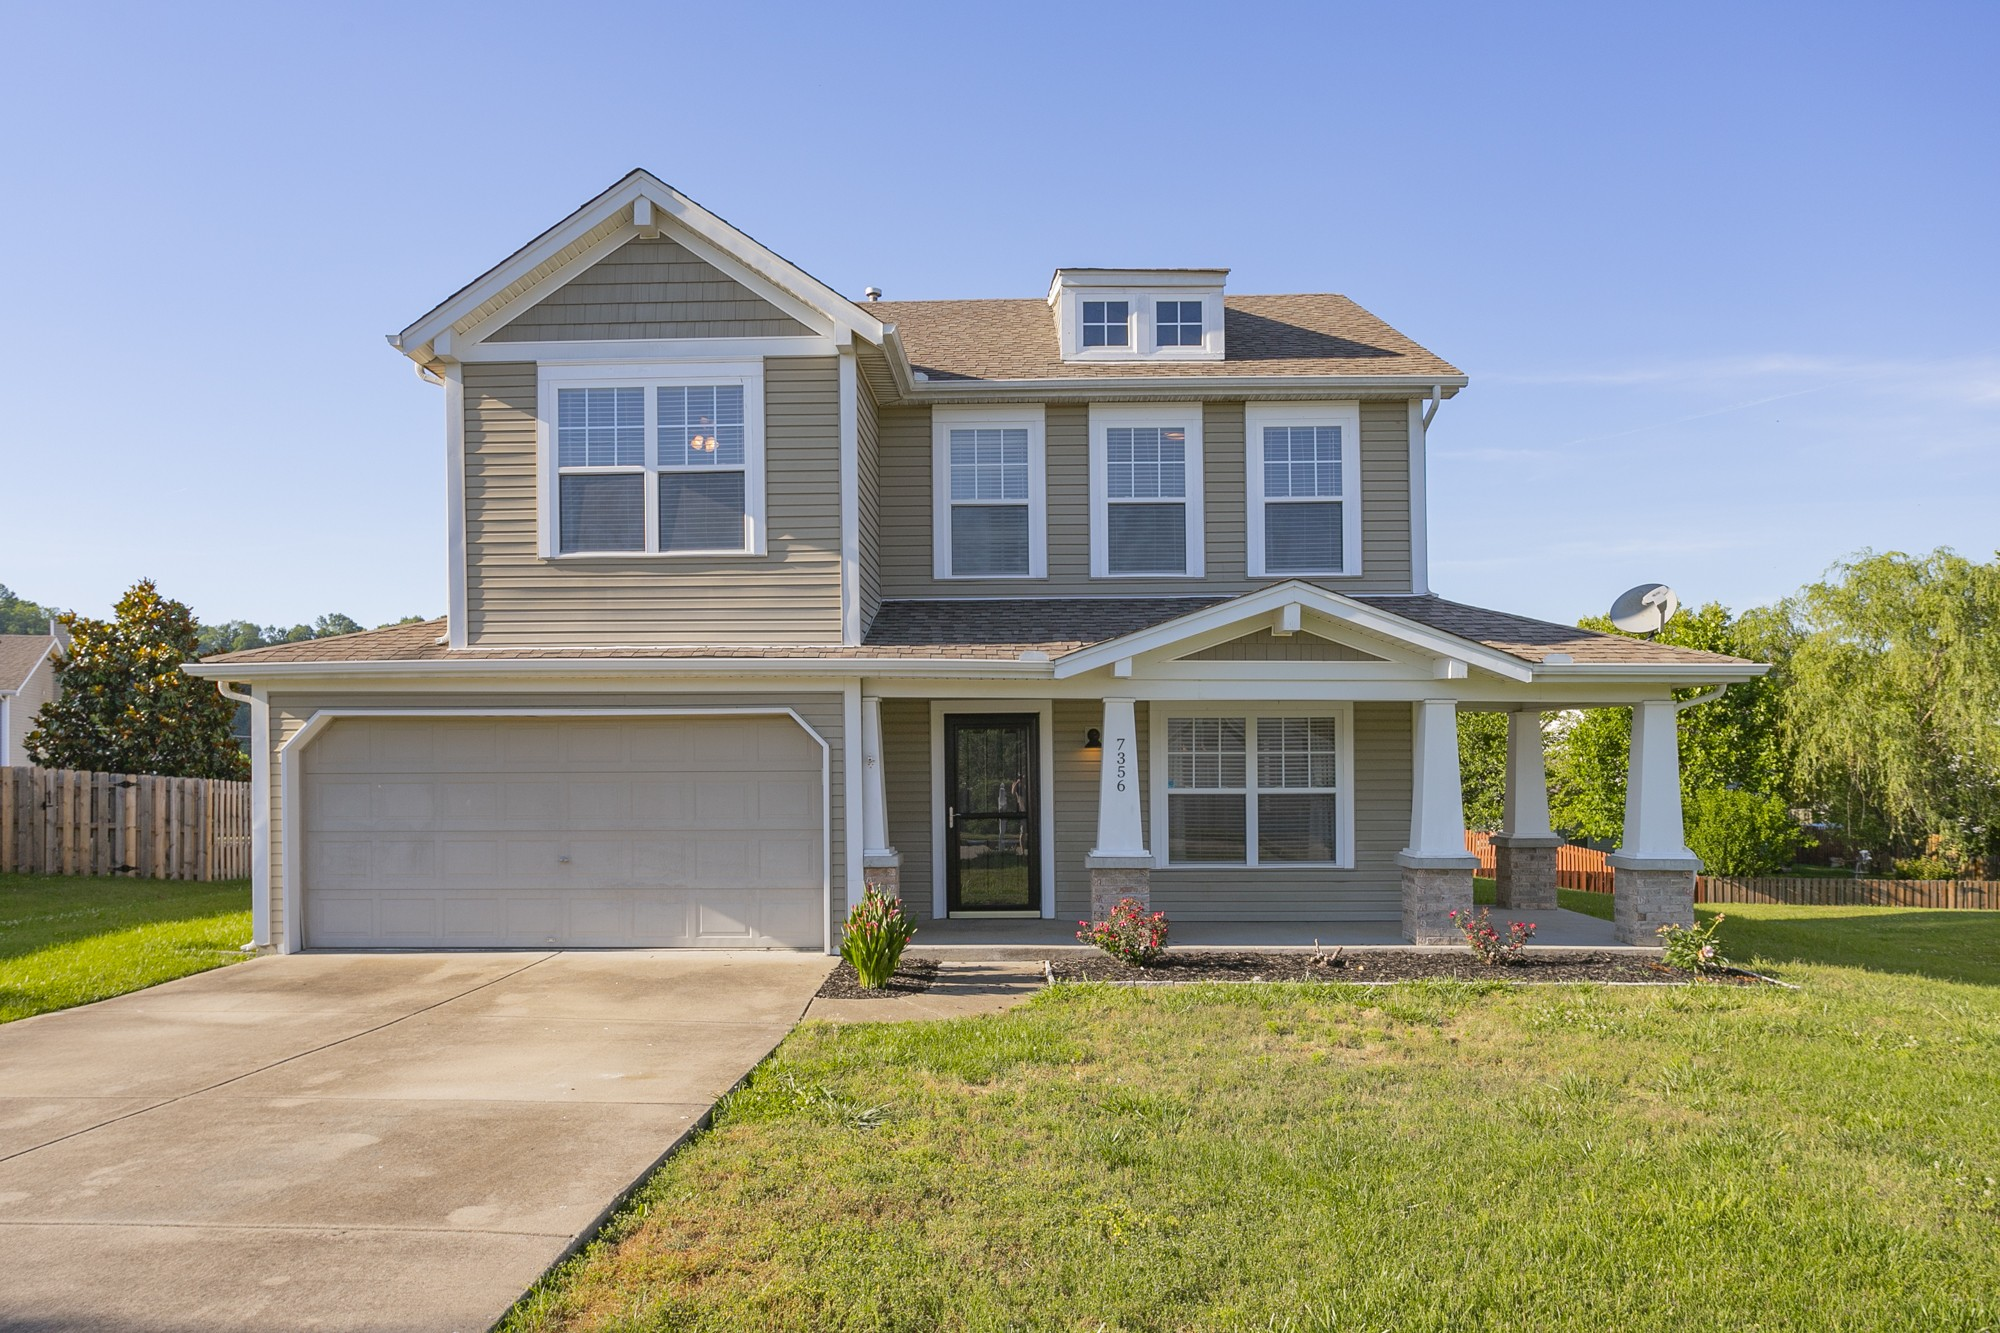 7356 Middlebrook Cir Property Photo - Nashville, TN real estate listing